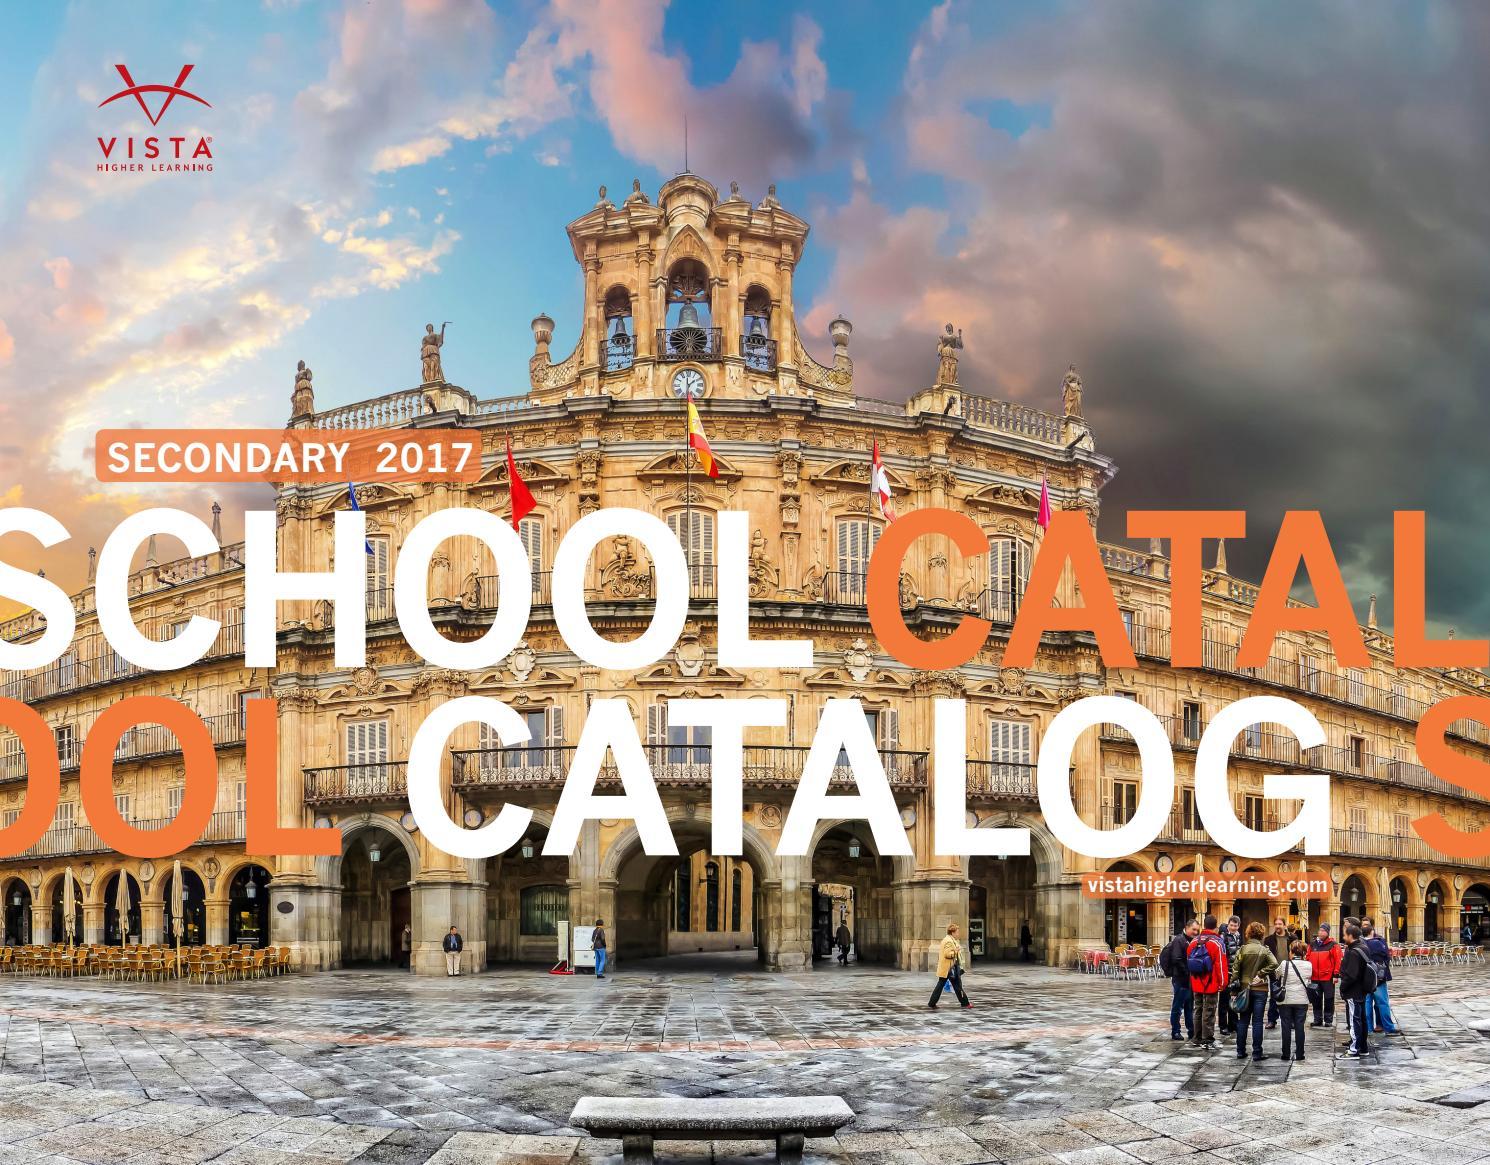 Vista Higher Learning School 2017 Catalog by Vista Higher Learning - issuu